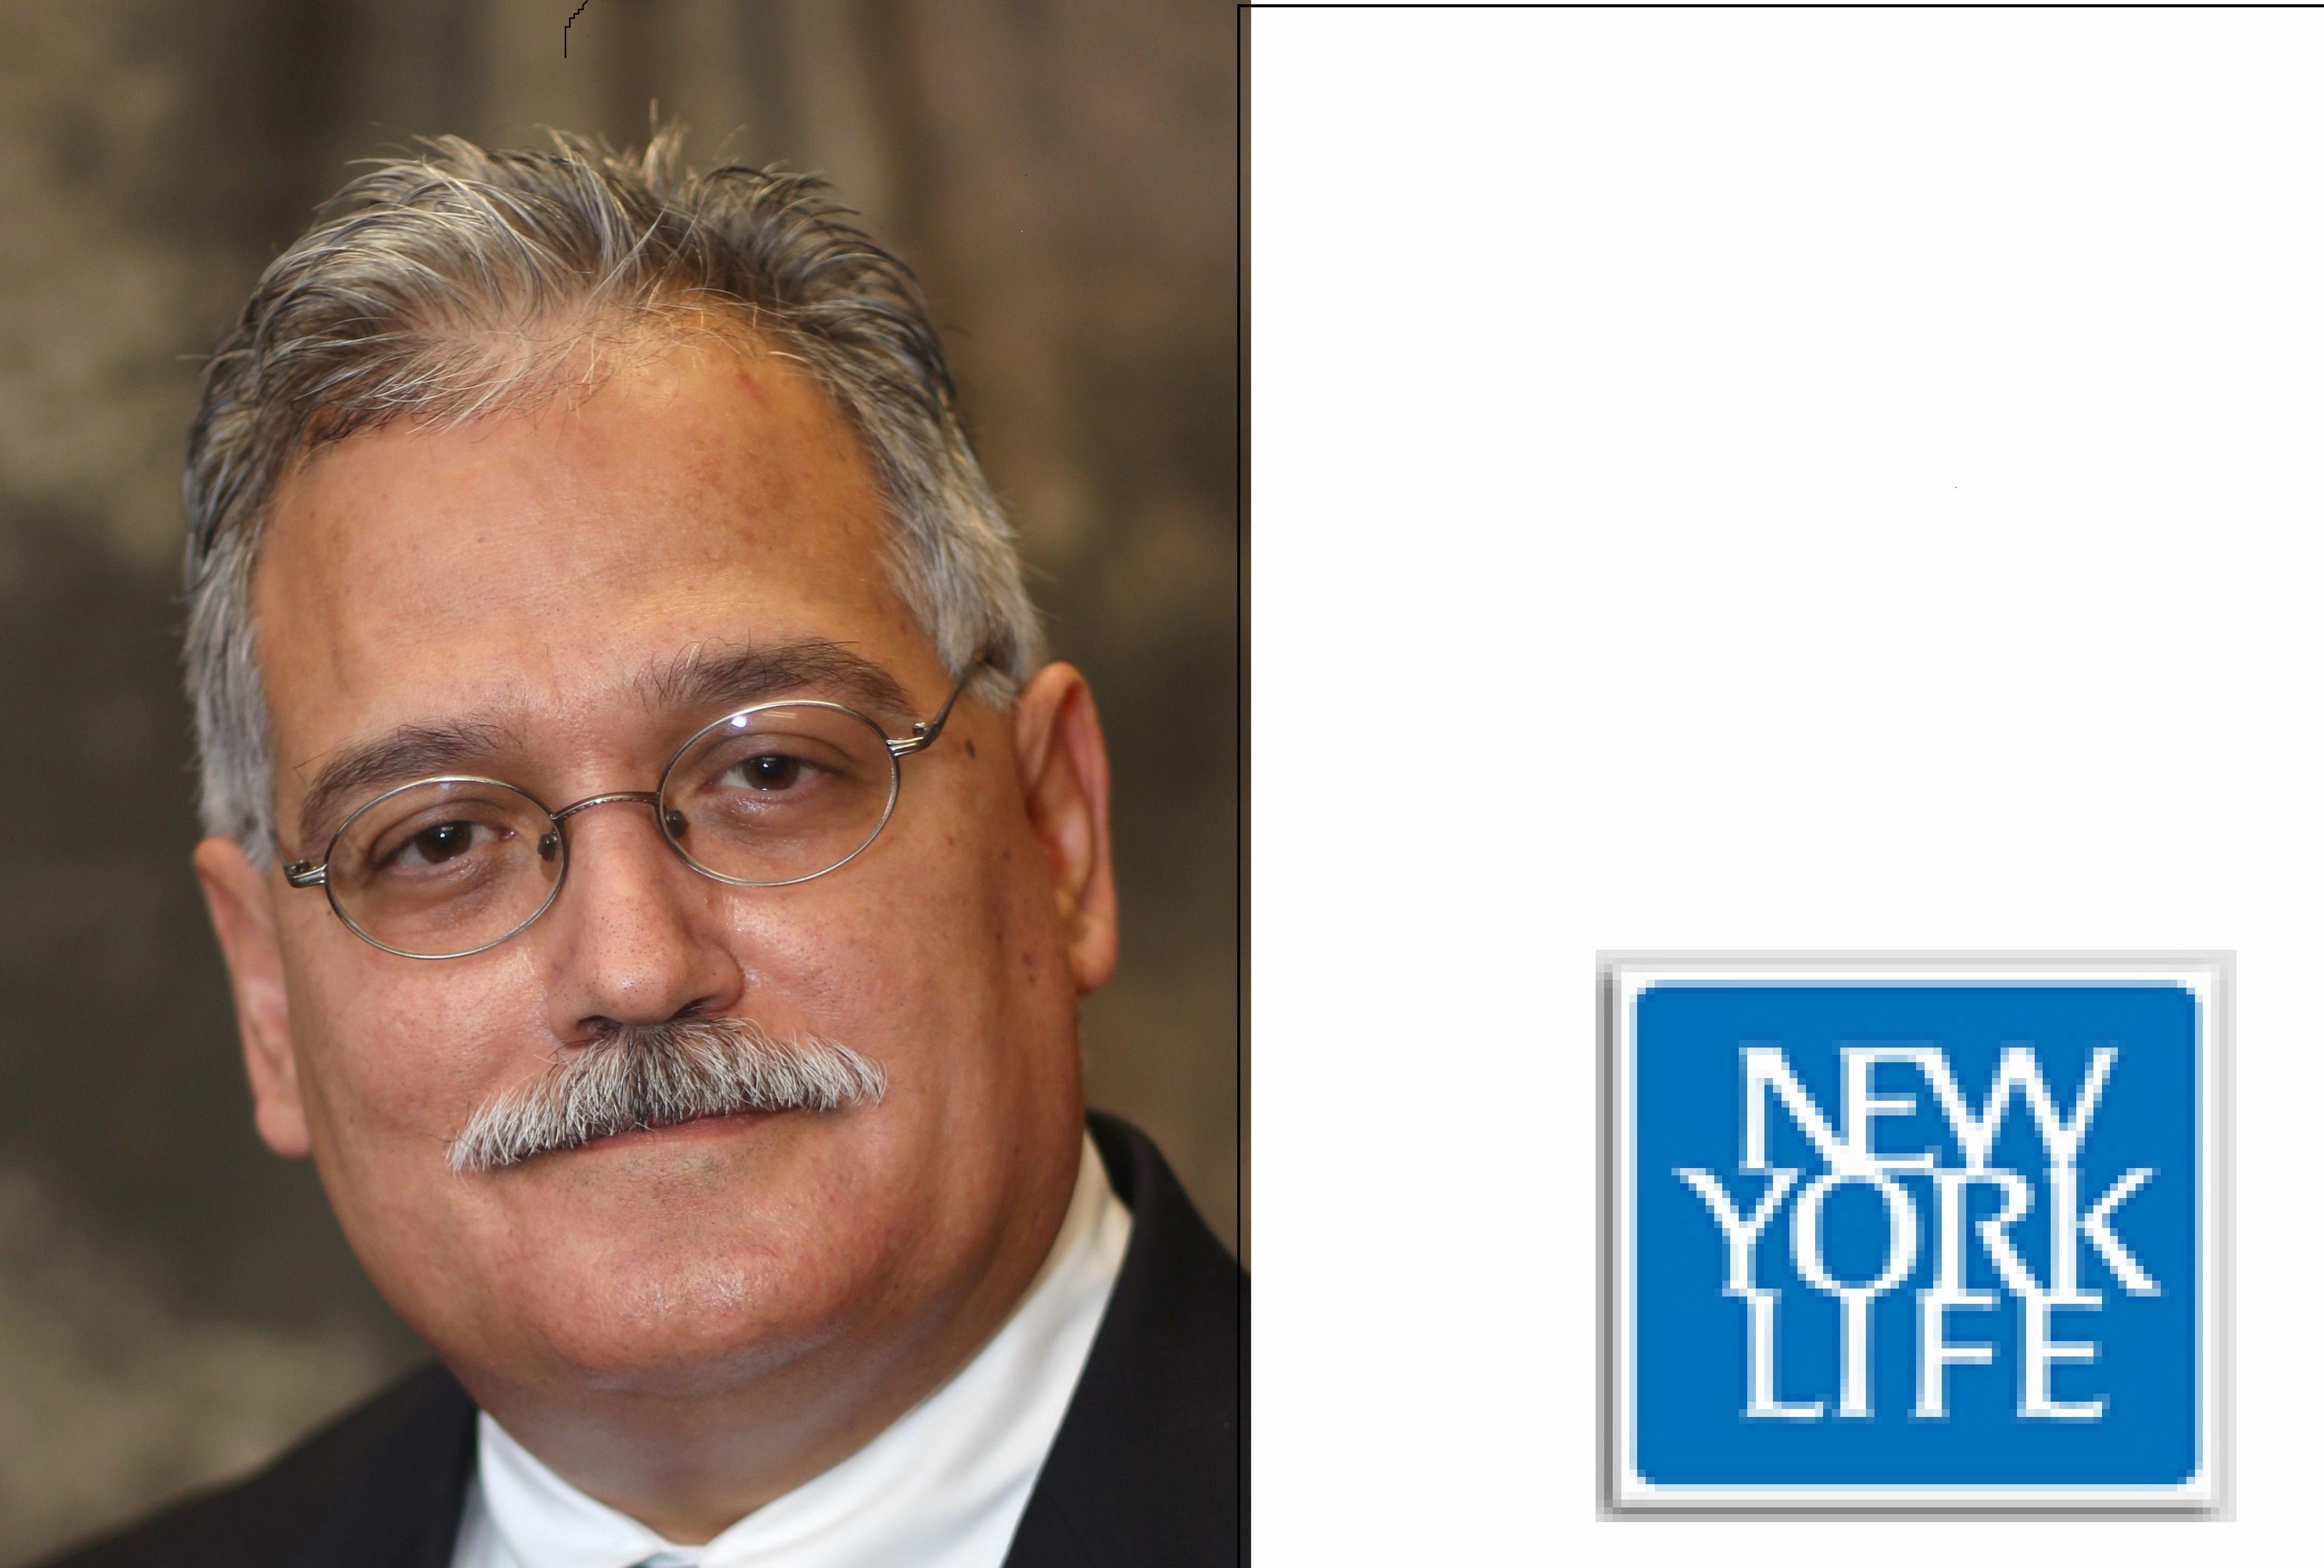 MARIO ALVARENGA Your Financial Professional & Insurance Agent